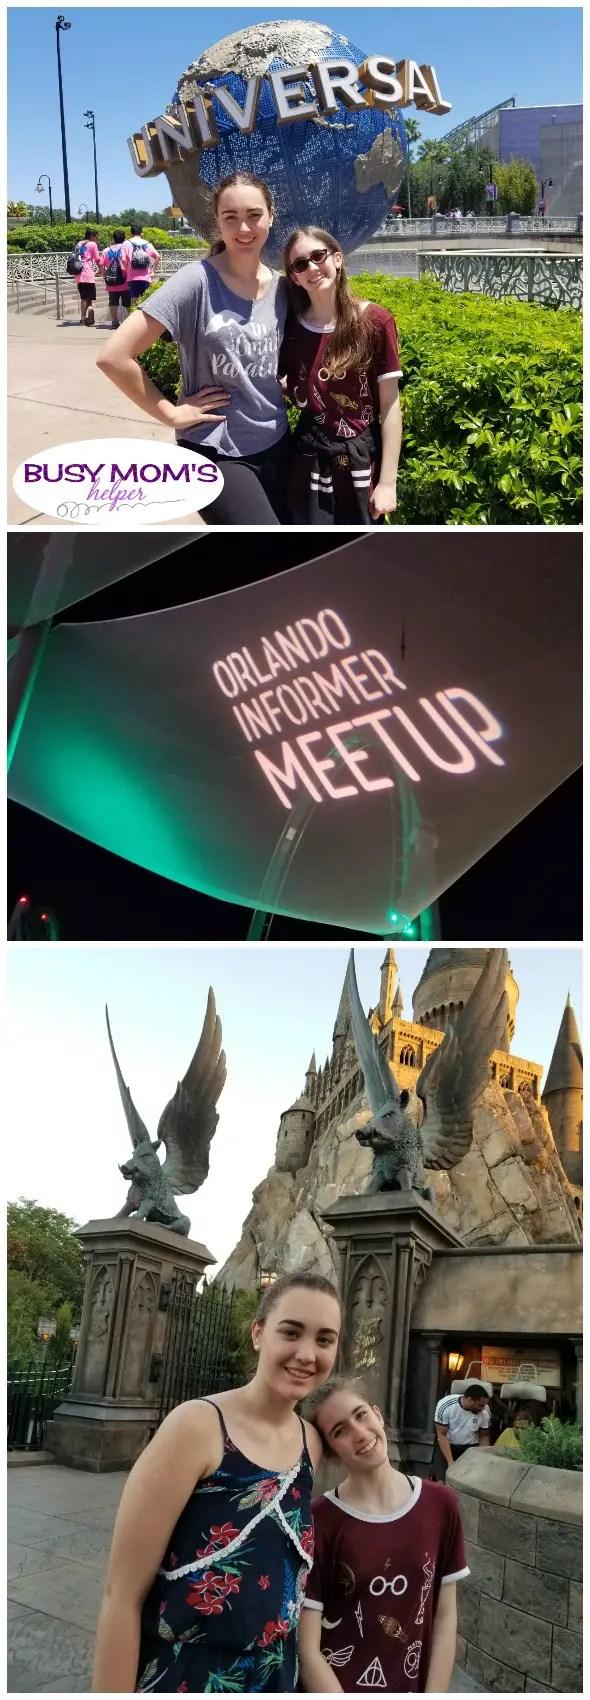 Our First Orlando Informer Meetup #orlandoinformer #oimeetup #universalorlando #universalstudios #travel